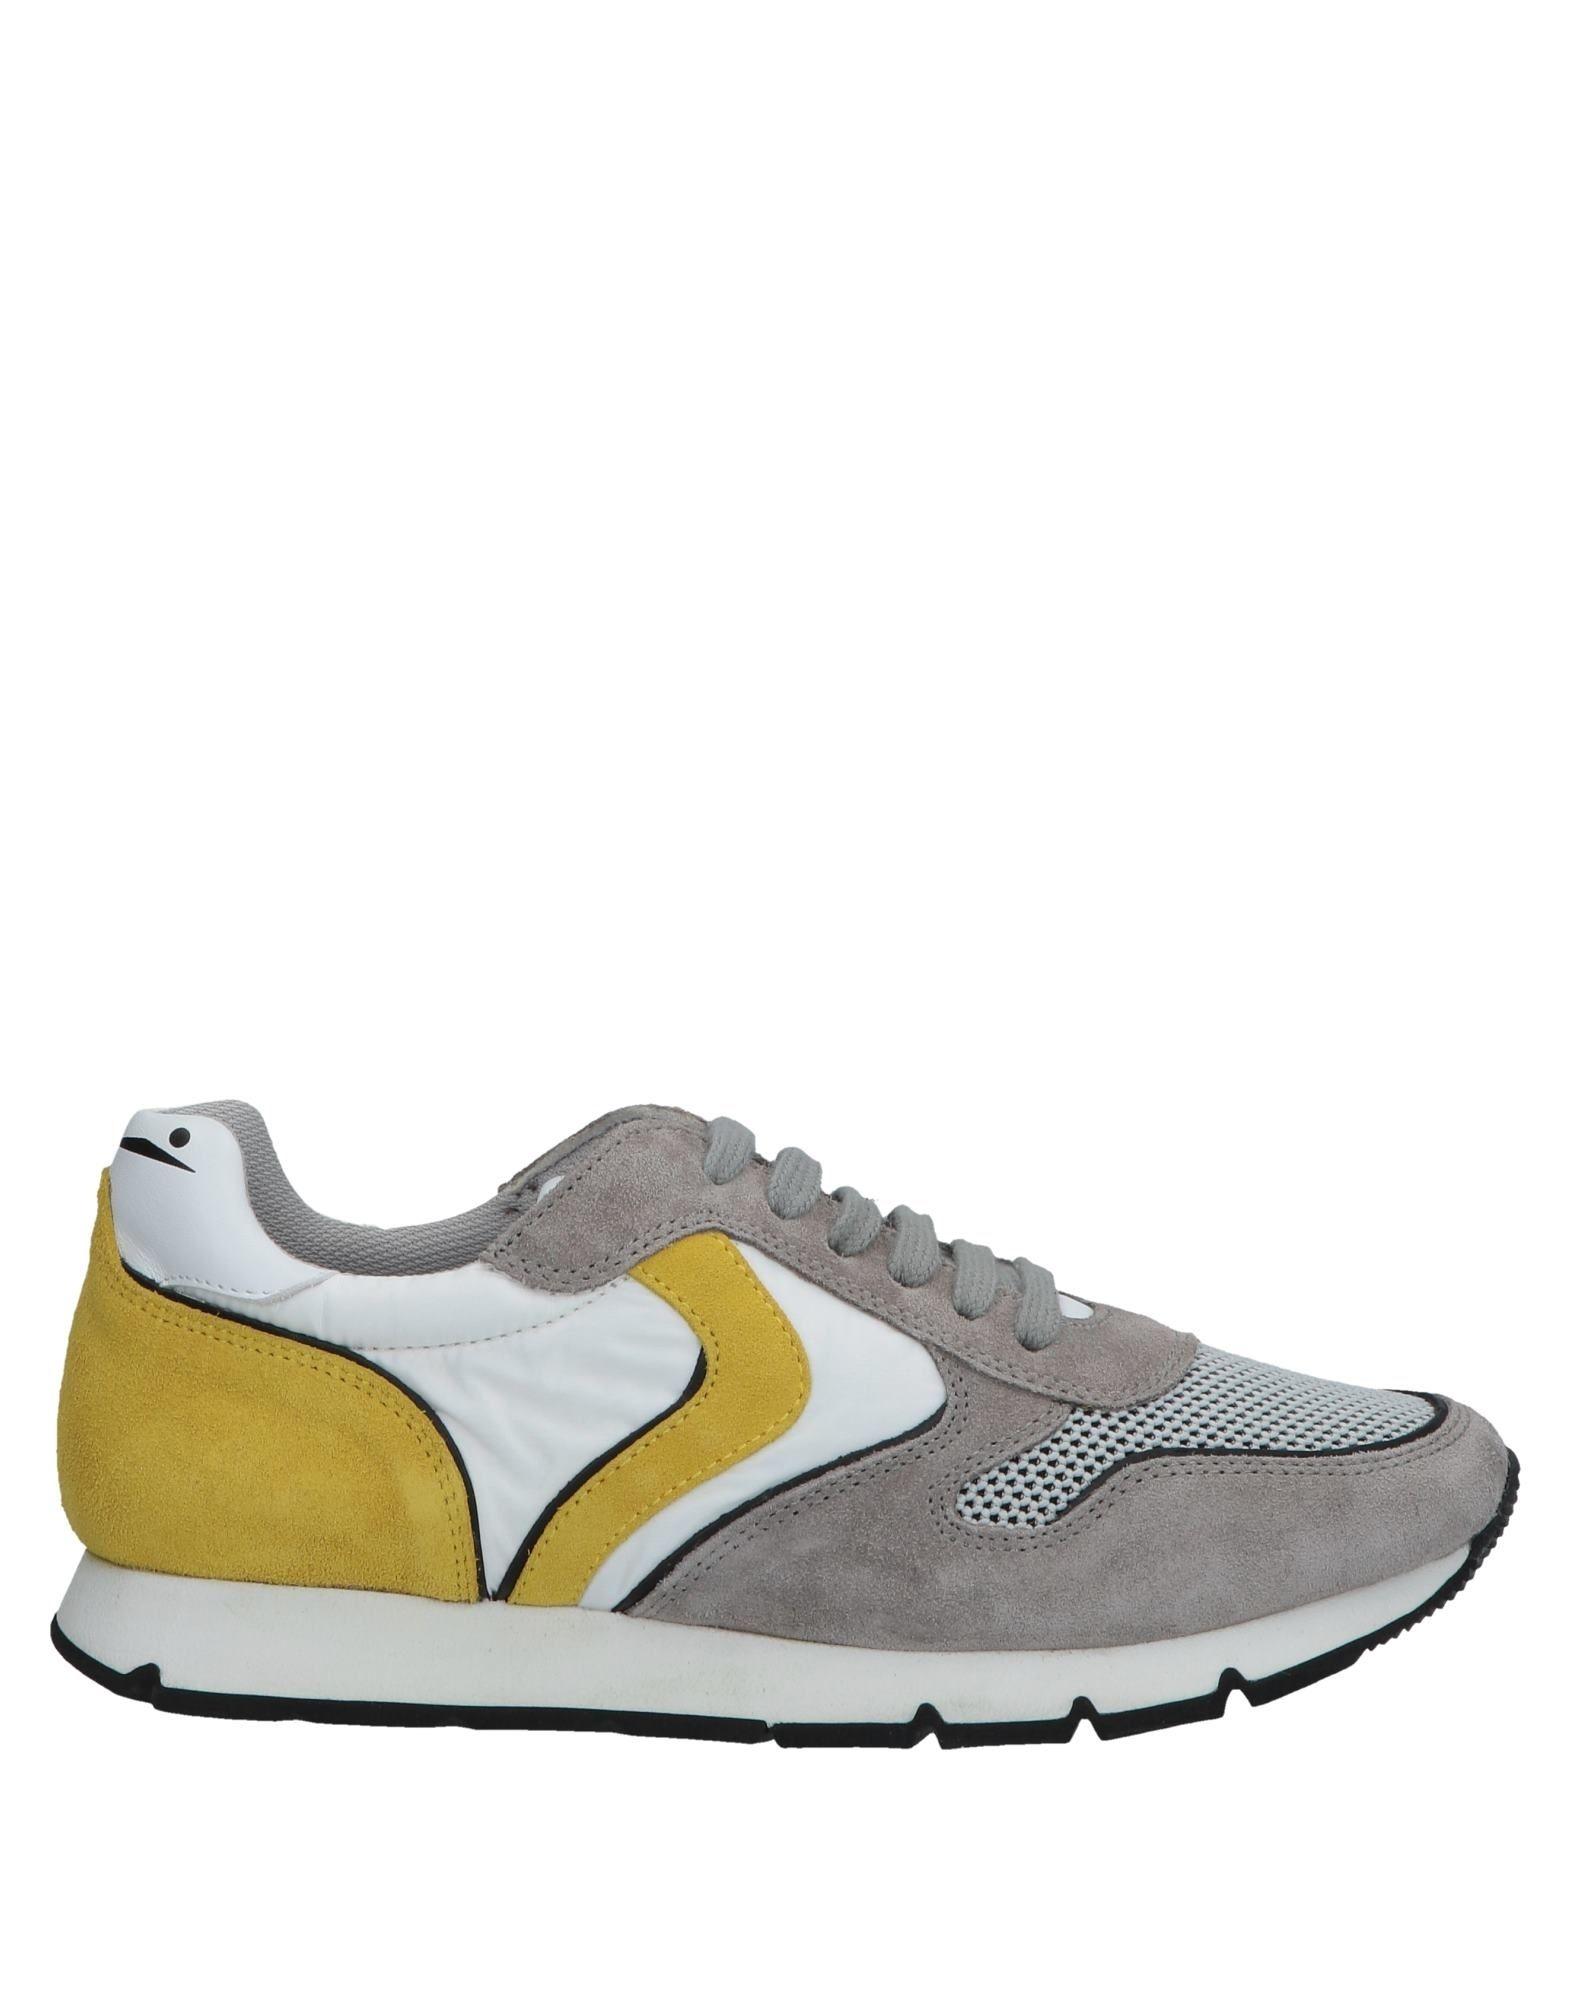 Stilvolle billige Schuhe Voile 11575114PB Blanche Sneakers Damen  11575114PB Voile 5221da